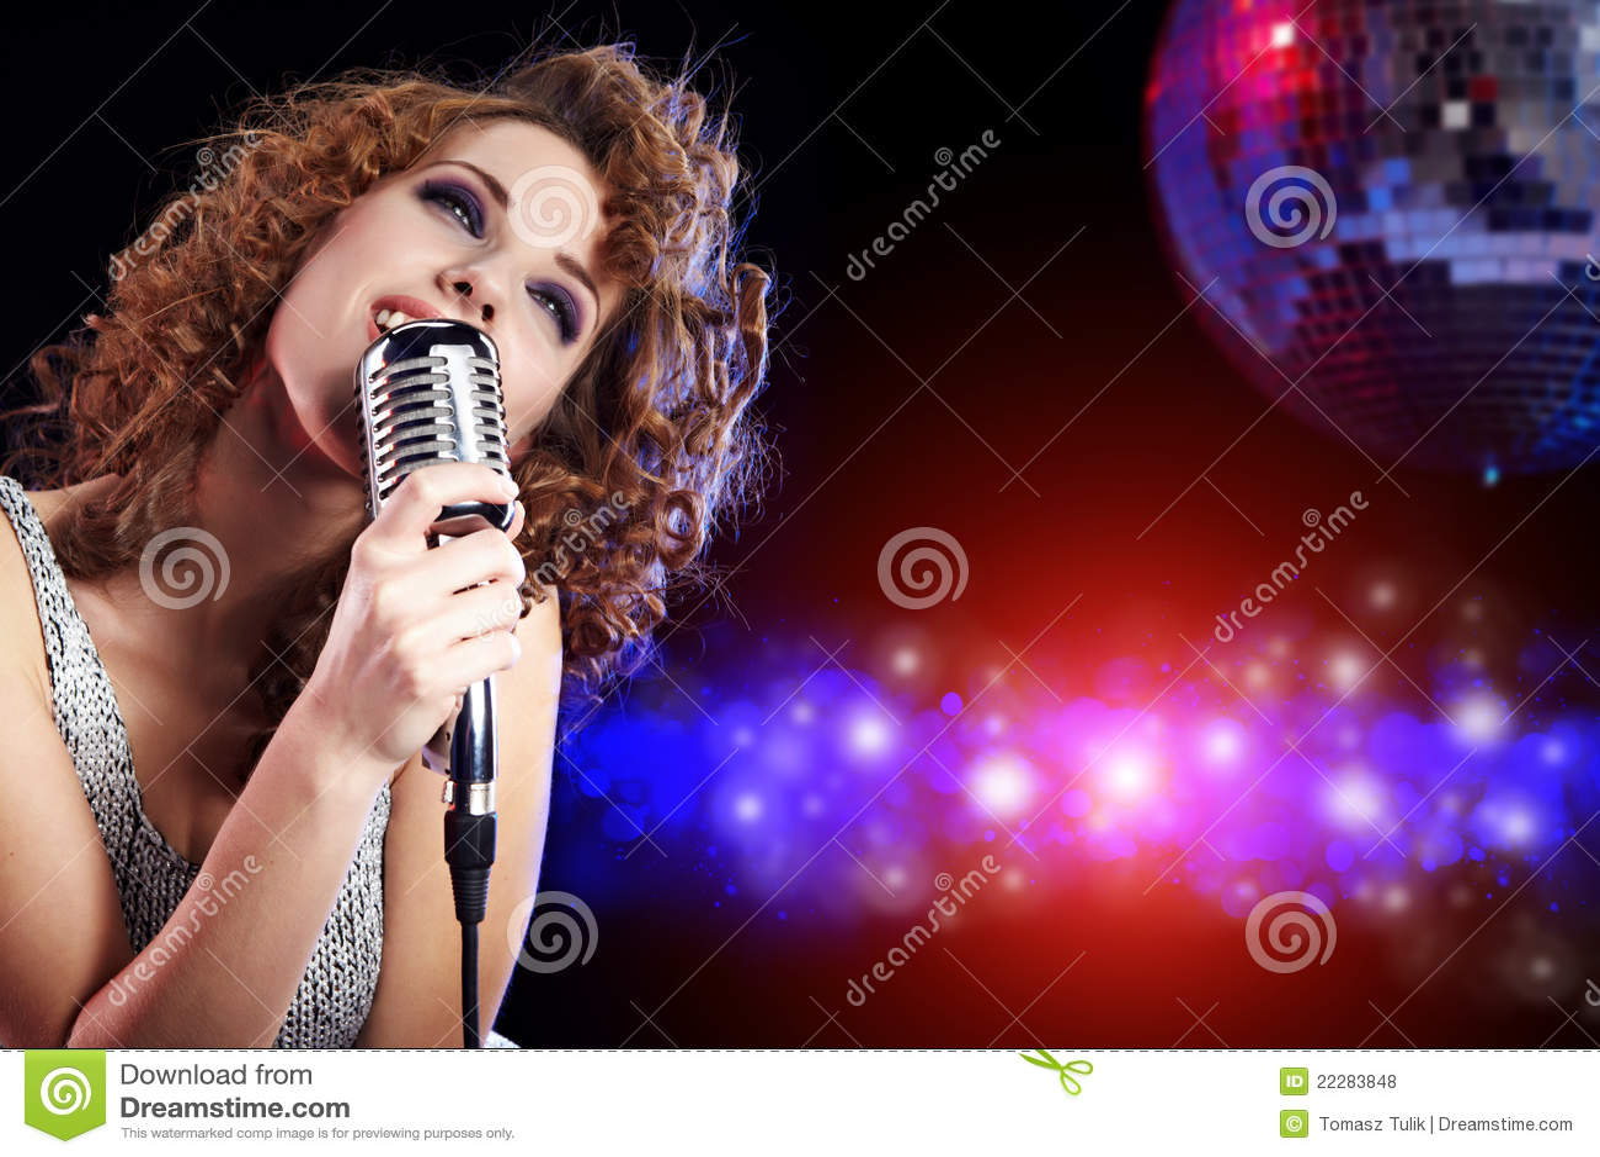 singing the girl retro - photo #27